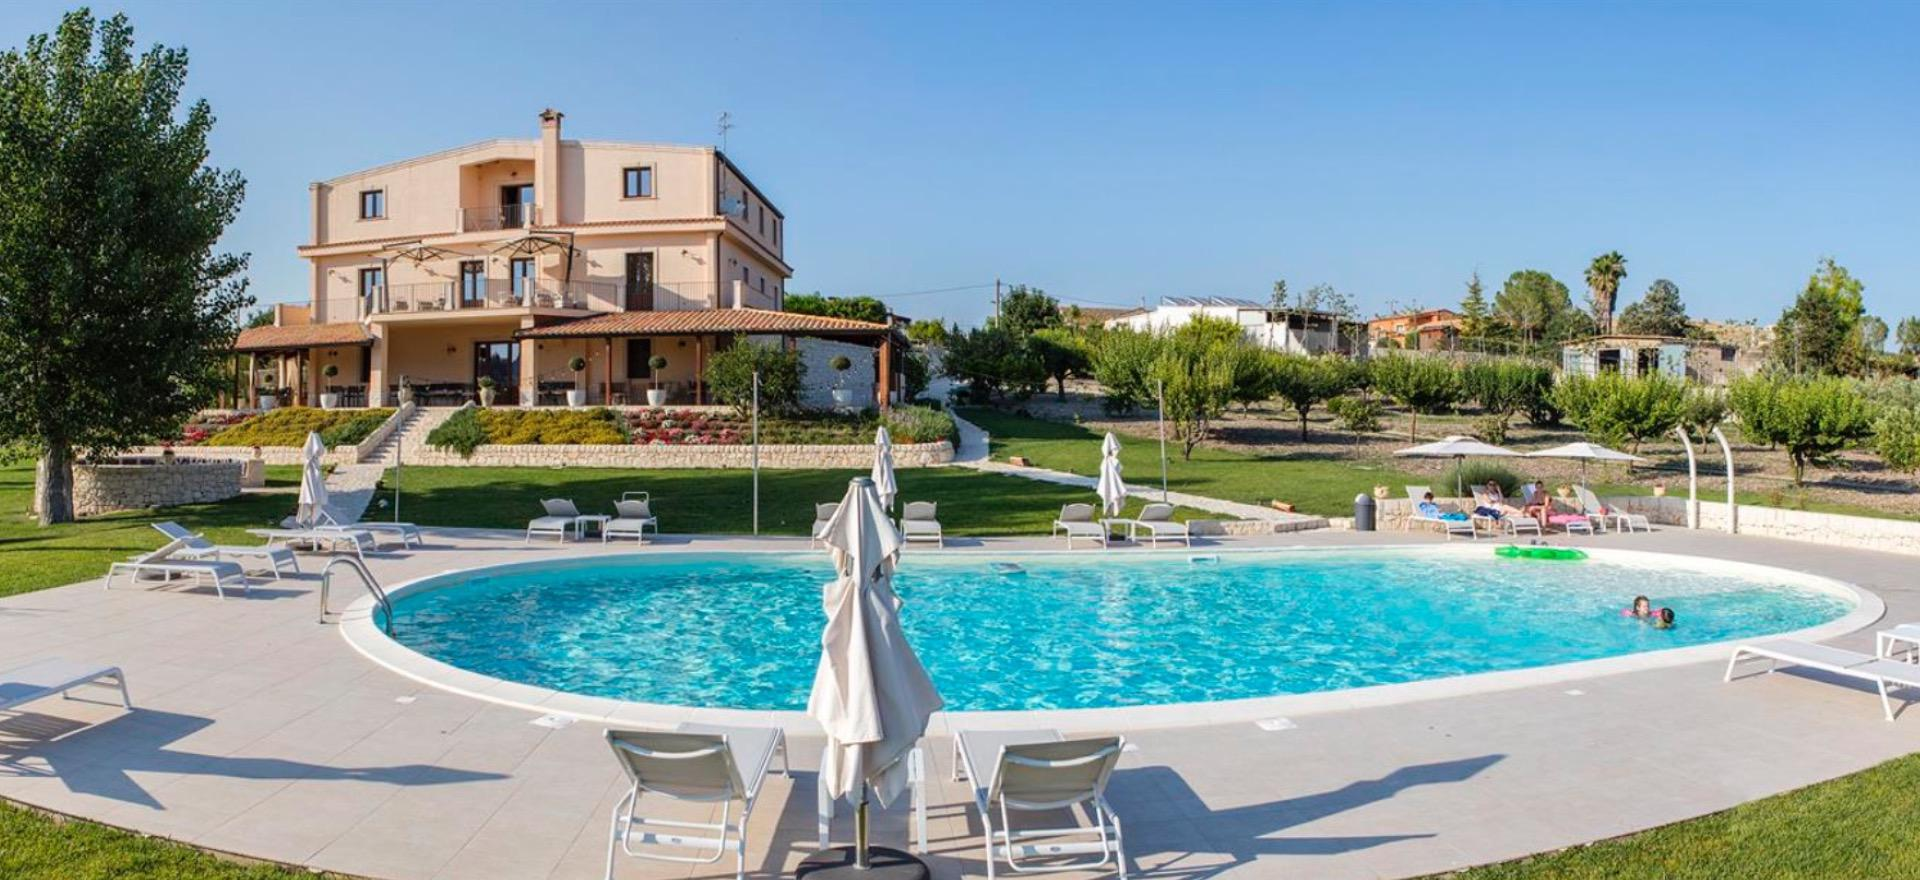 Kindvriendelijke agriturismo Sicilië met prachtig zwembad